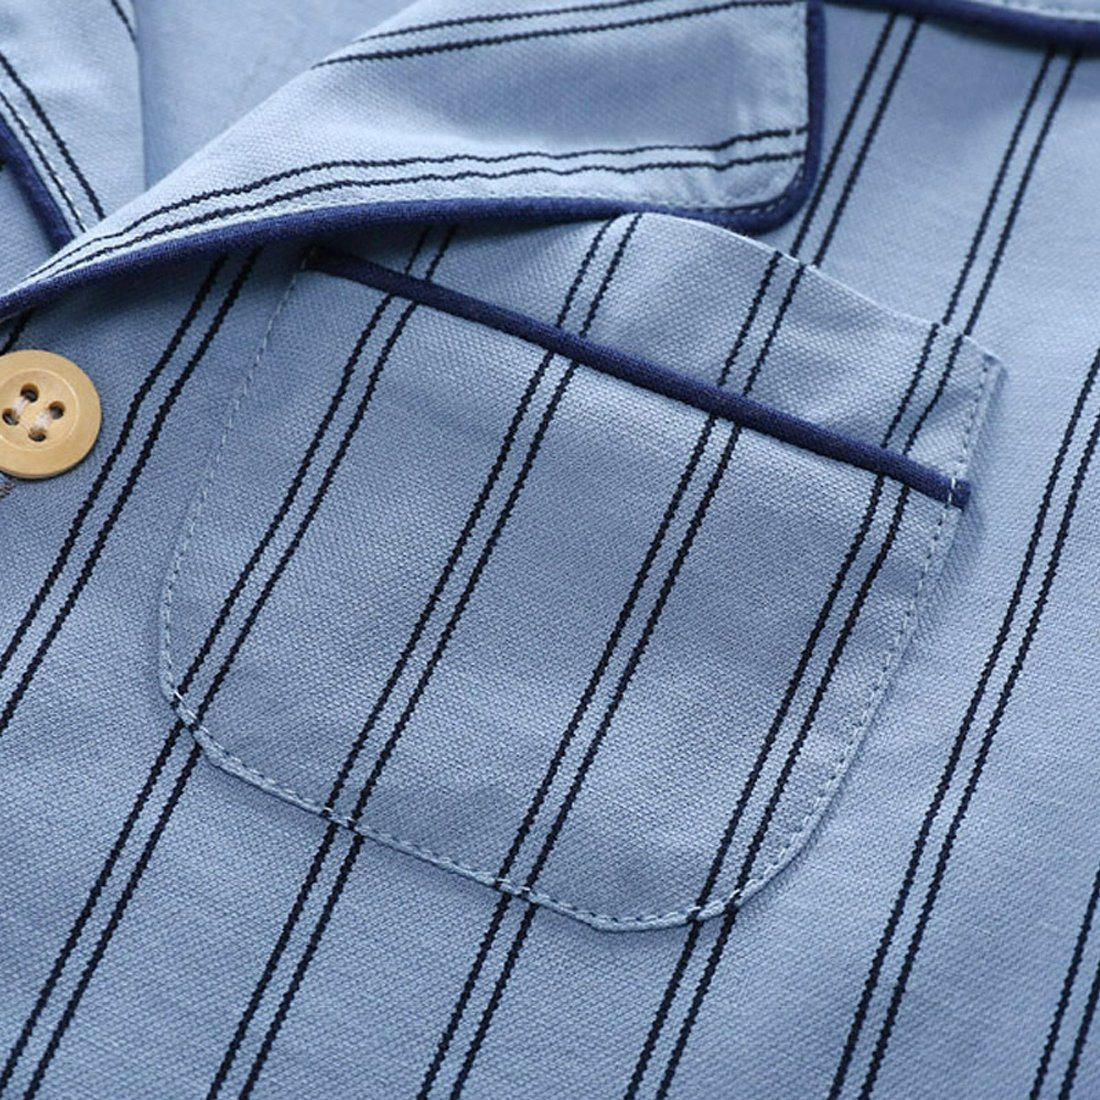 PAUBOLI Boys Button Down Pajamas Set Short Sleeve Organic Cotton Striped Sleepwear Loungewear (6-7 Years) by PAUBOLI (Image #3)